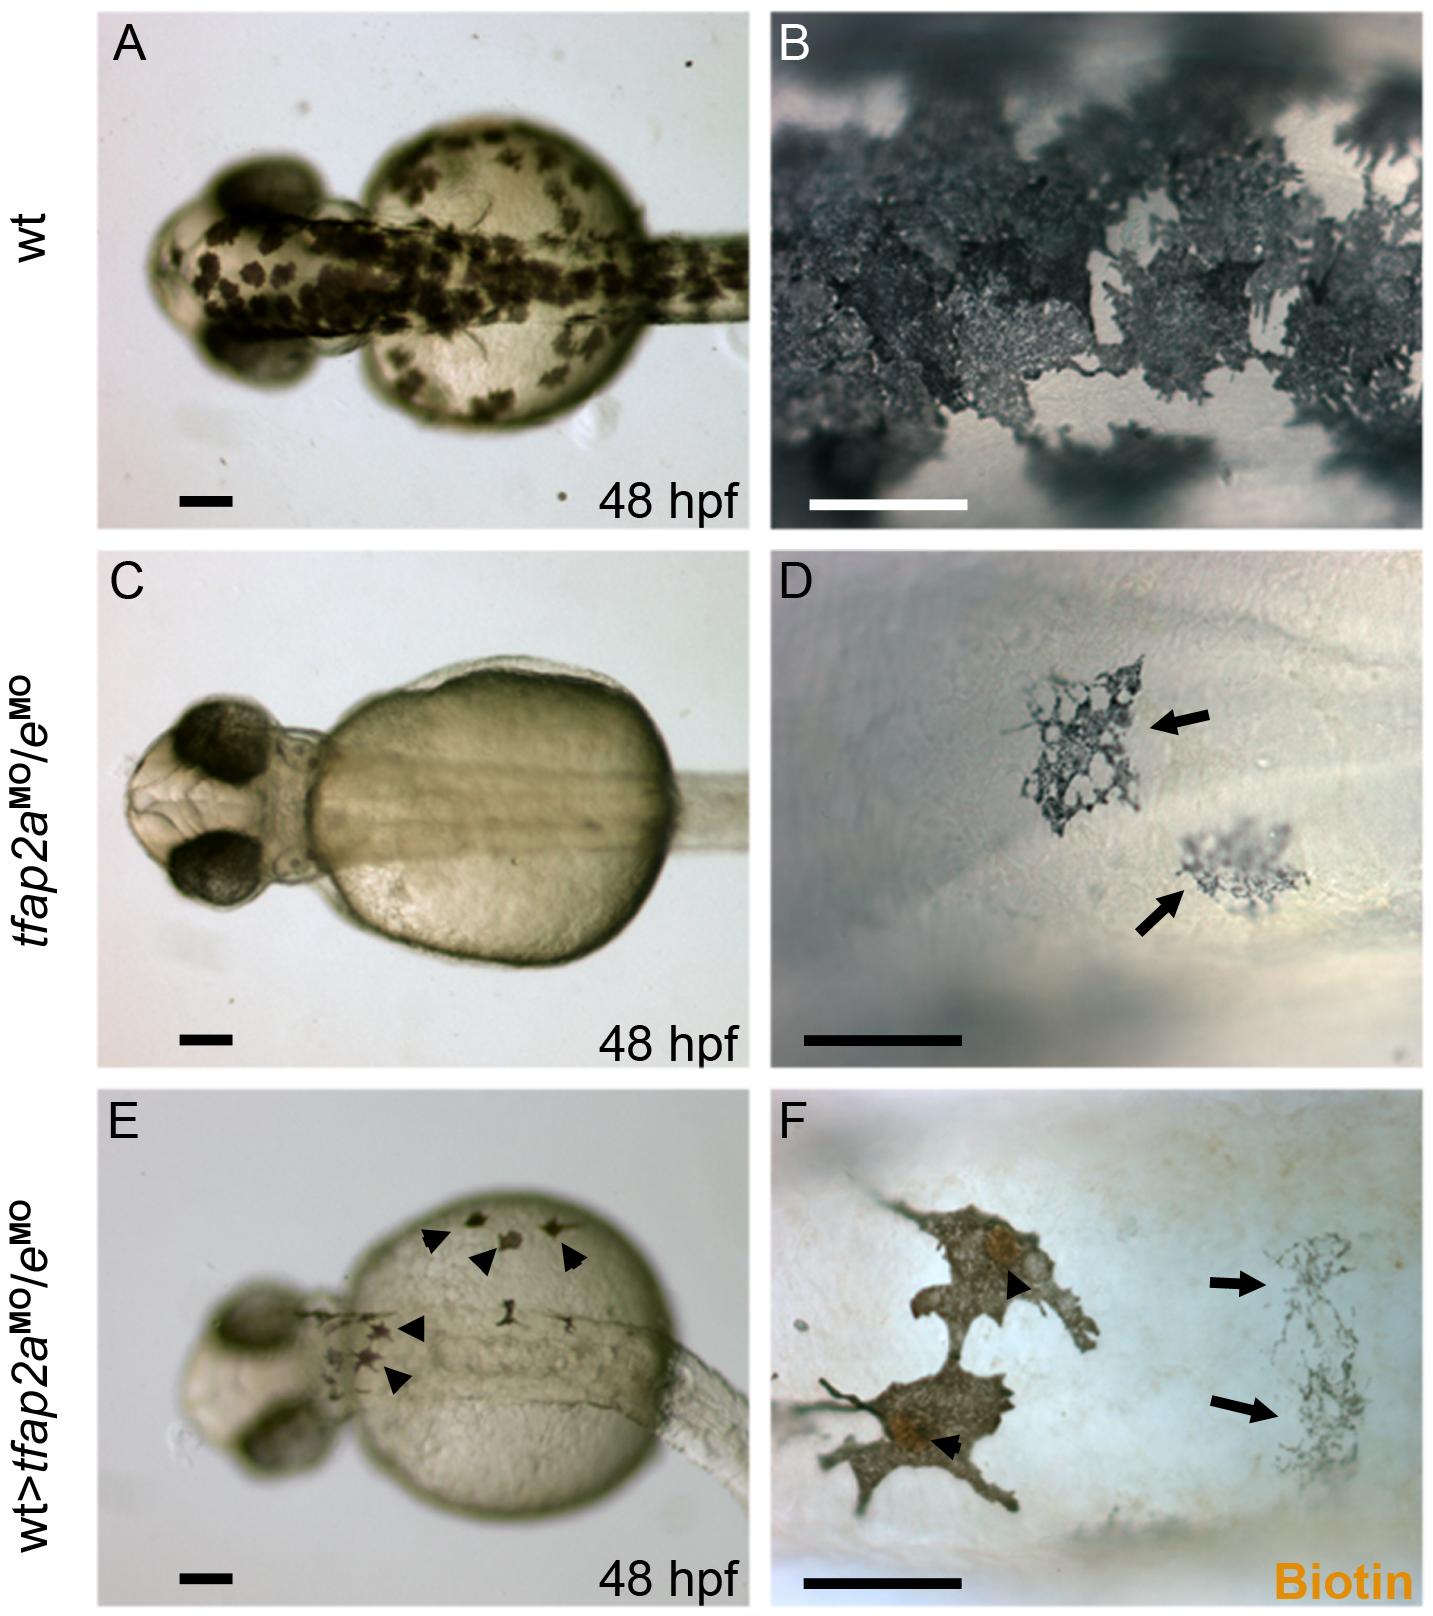 Tfap2a/e activity in melanophore differentiation appears to be cell-autonomous.